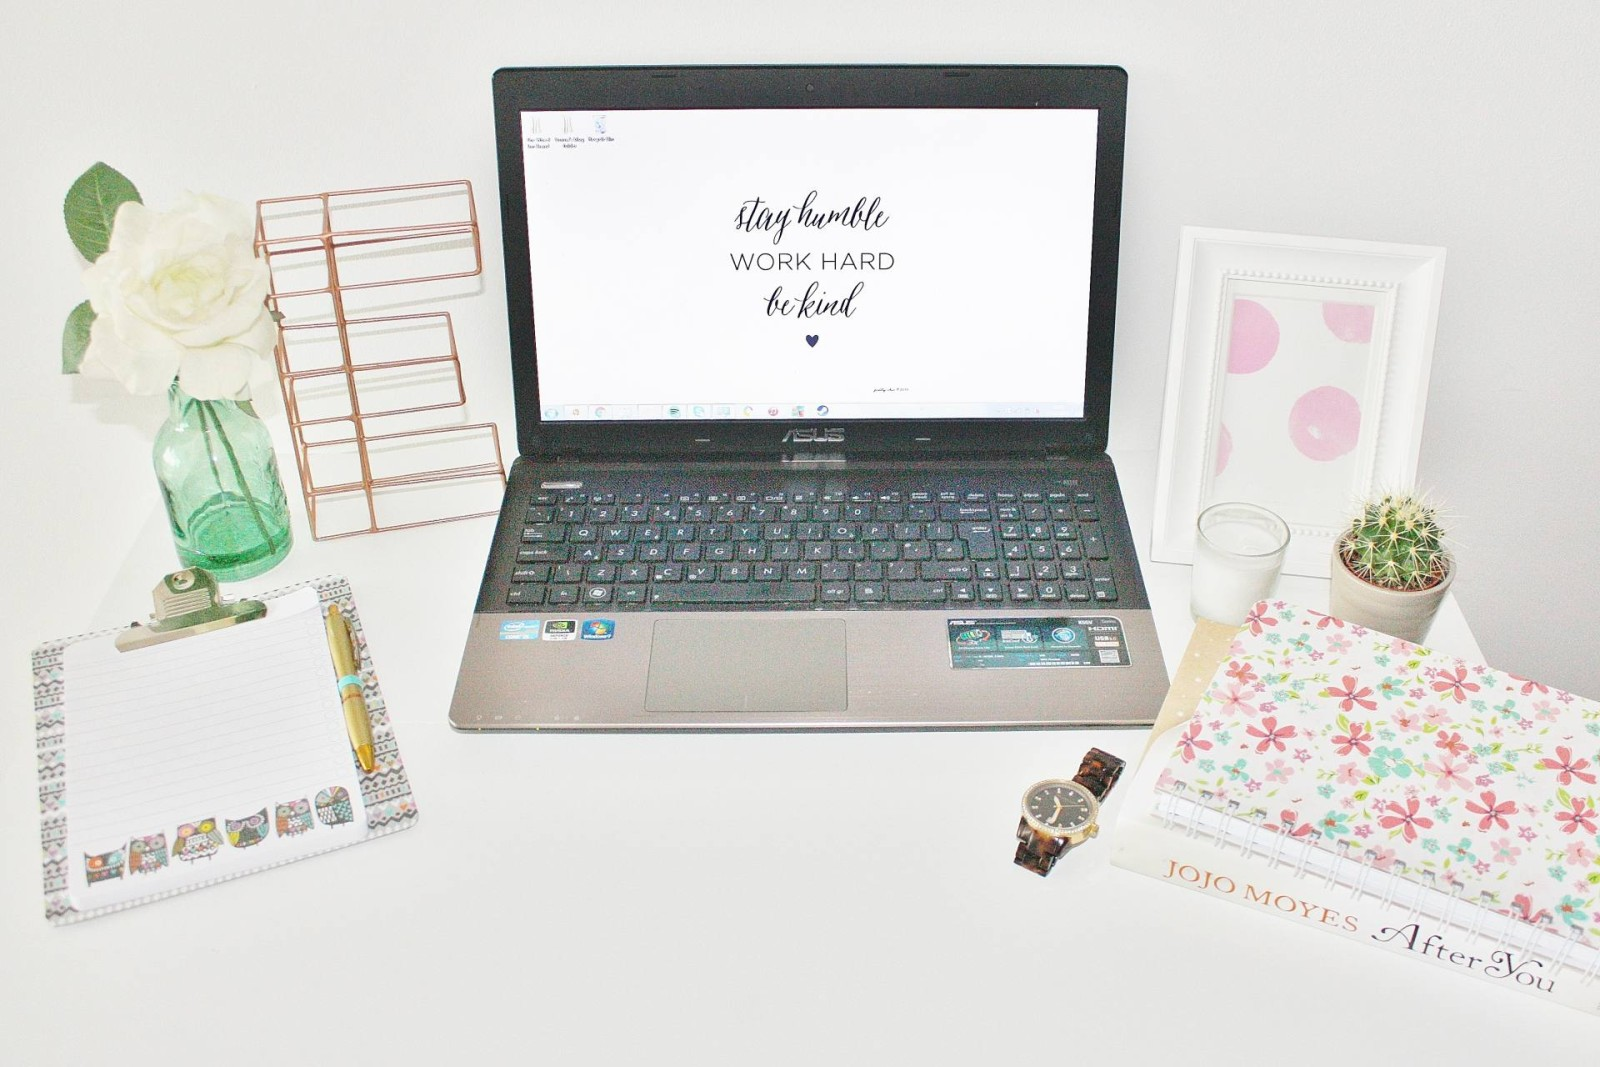 Emma Victoria Stokes Desk Job Blog